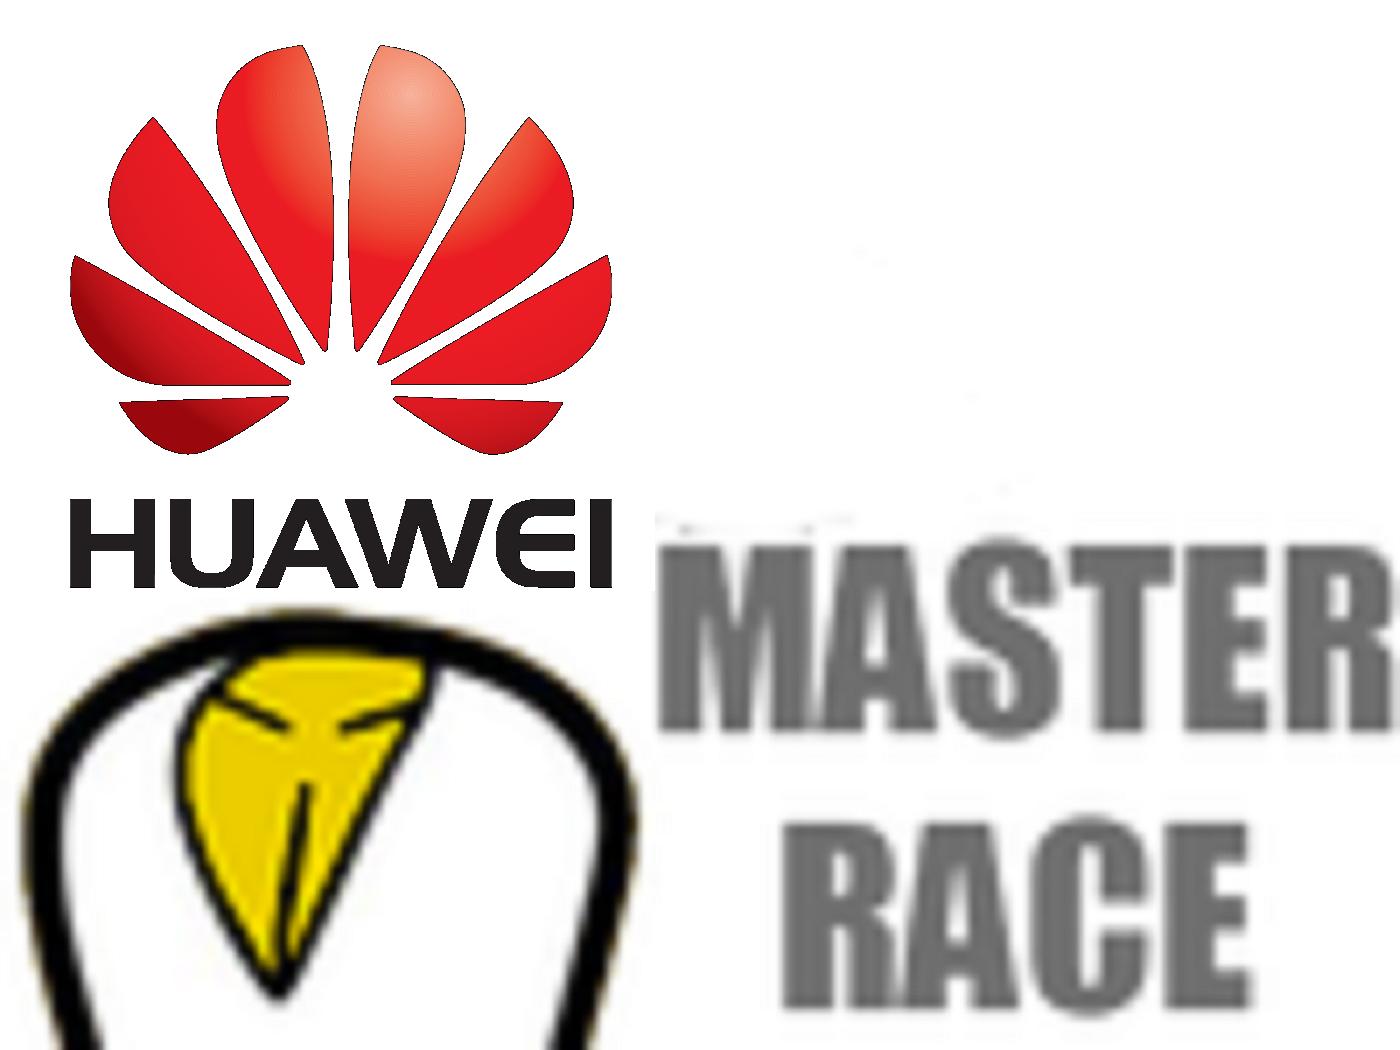 Sticker huawei master race w9 stickers jvc